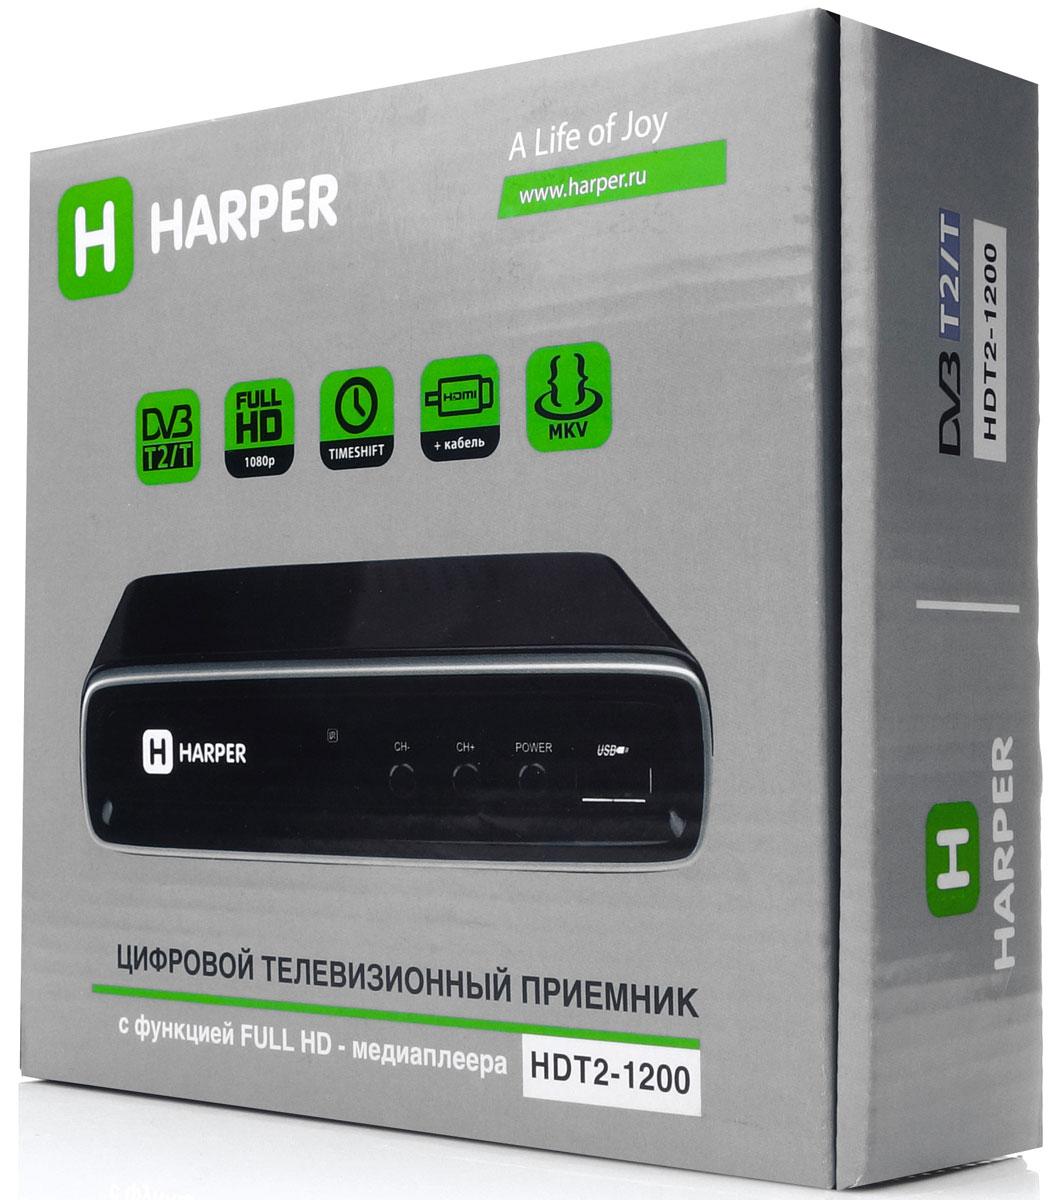 Harper HDT2-1200 телевизионный ресивер DVB-T2